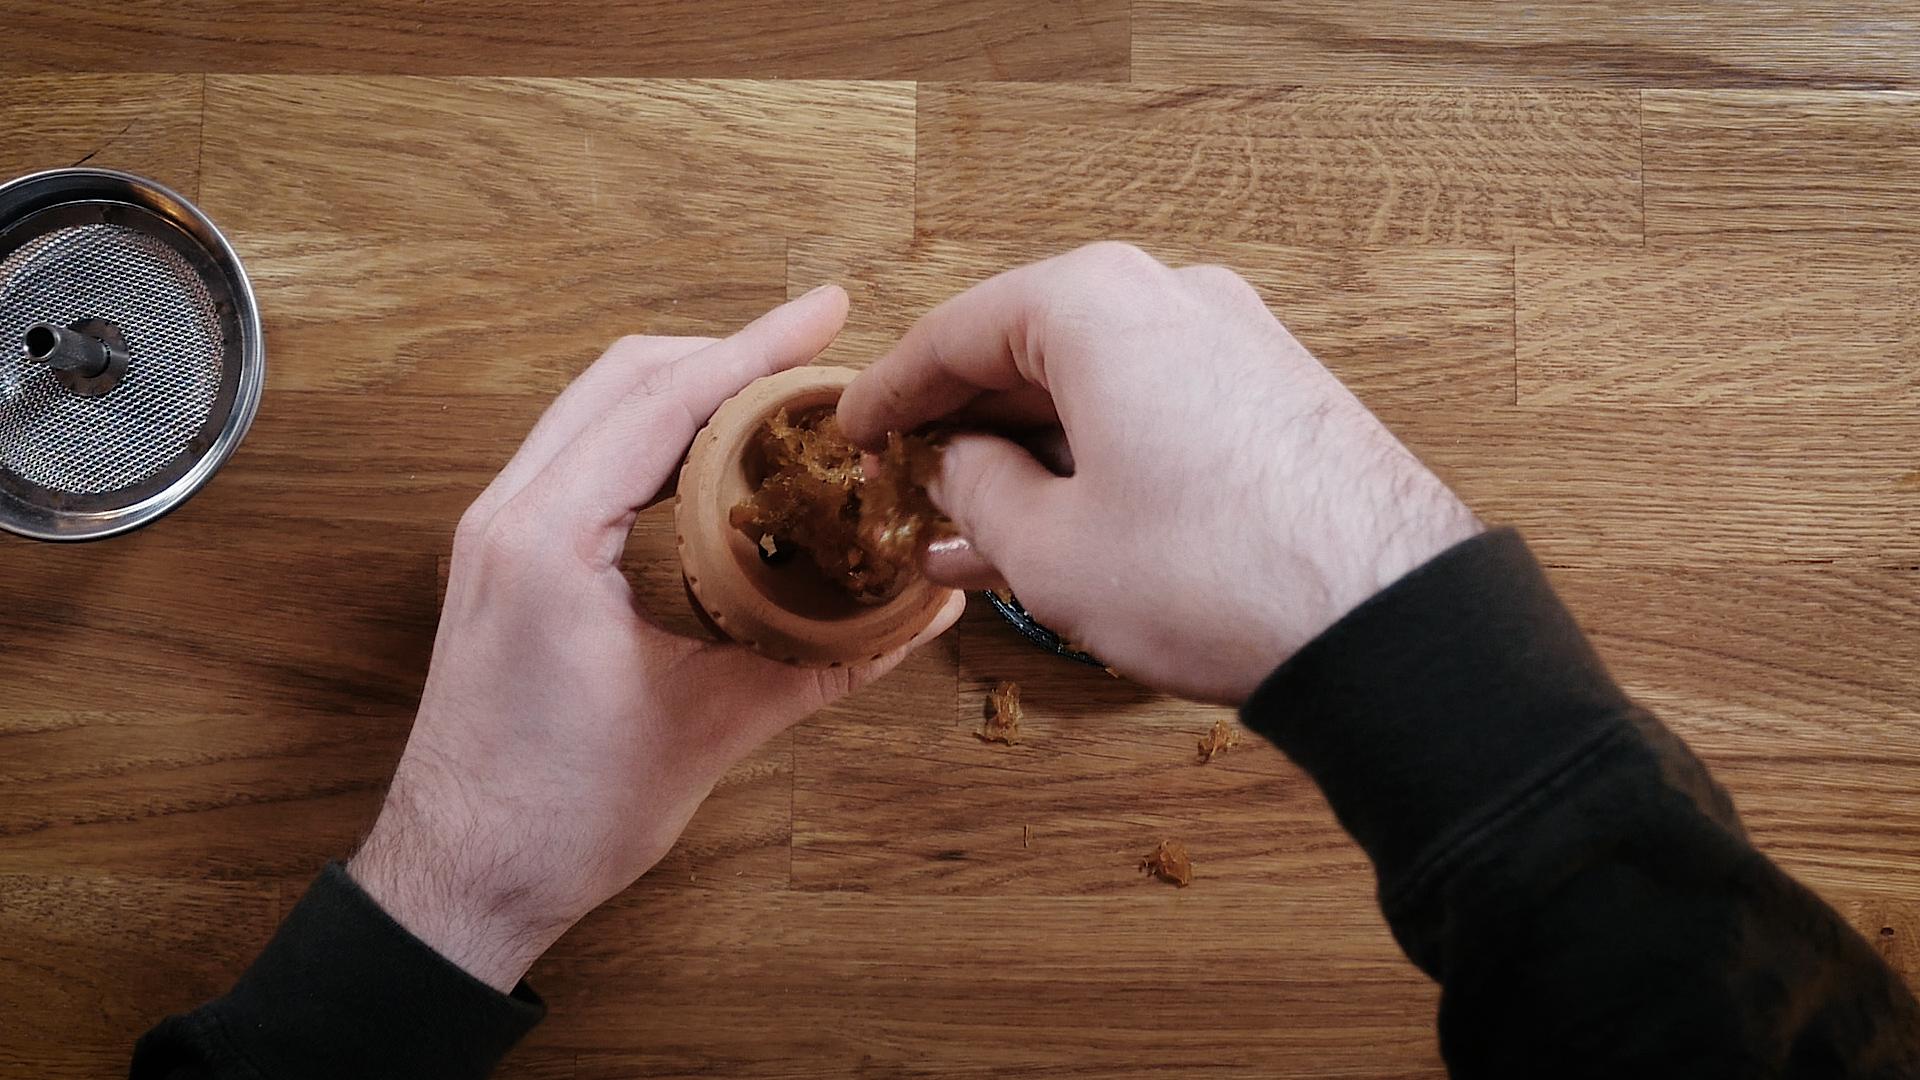 placer le tabac dans un foyer brohood